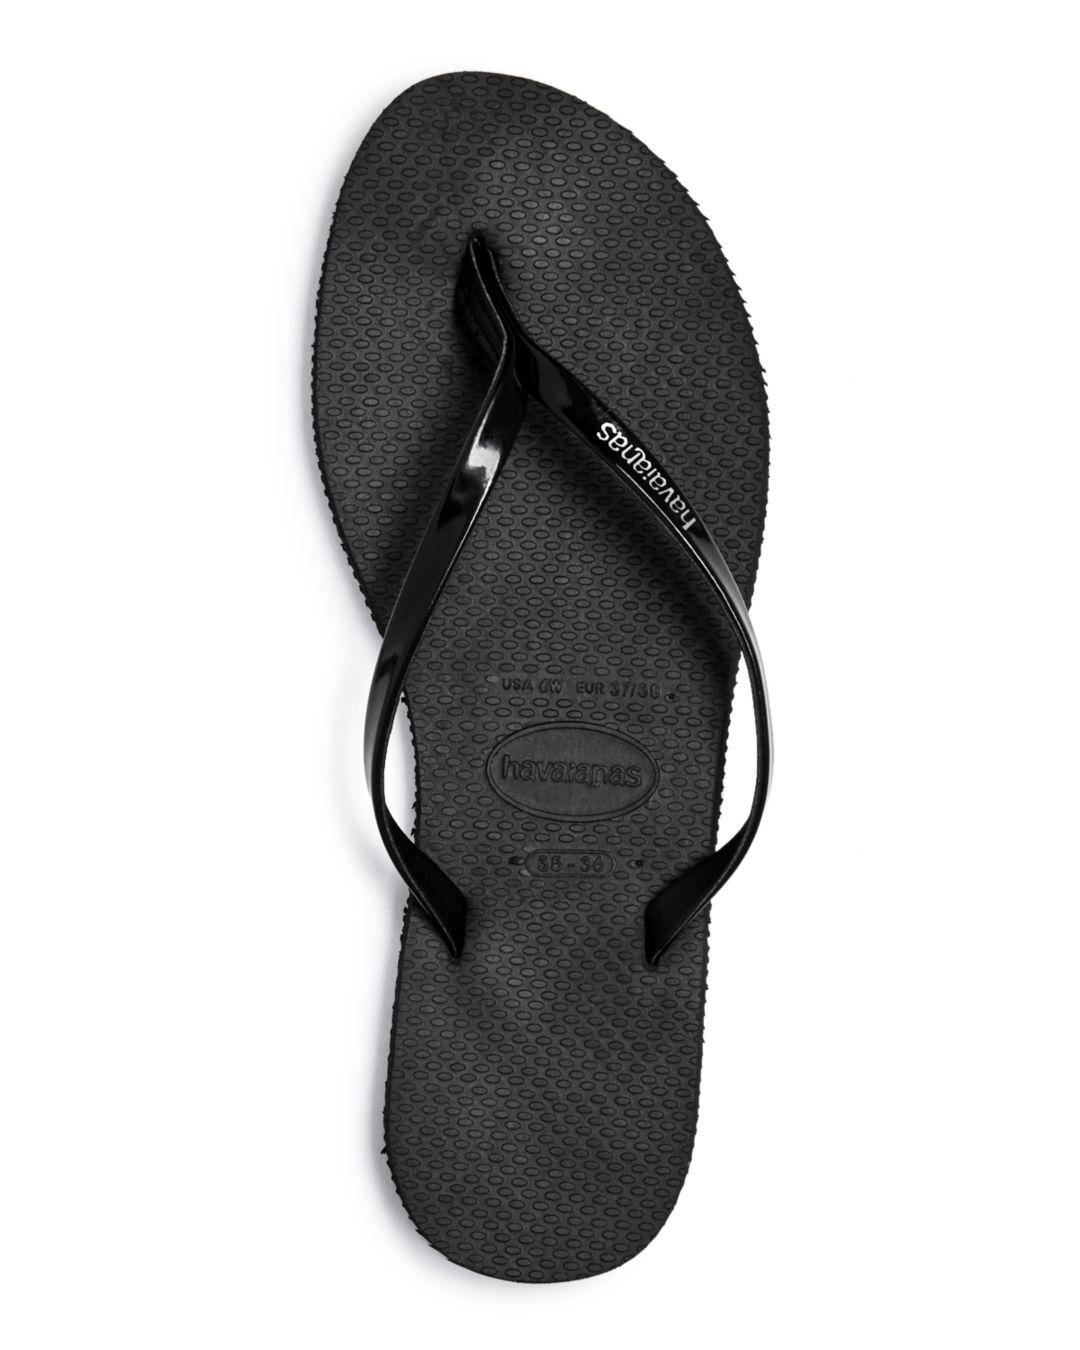 43e59453c Havaianas Women s You Metallic Slim Flip-flops in Black - Save 6% - Lyst